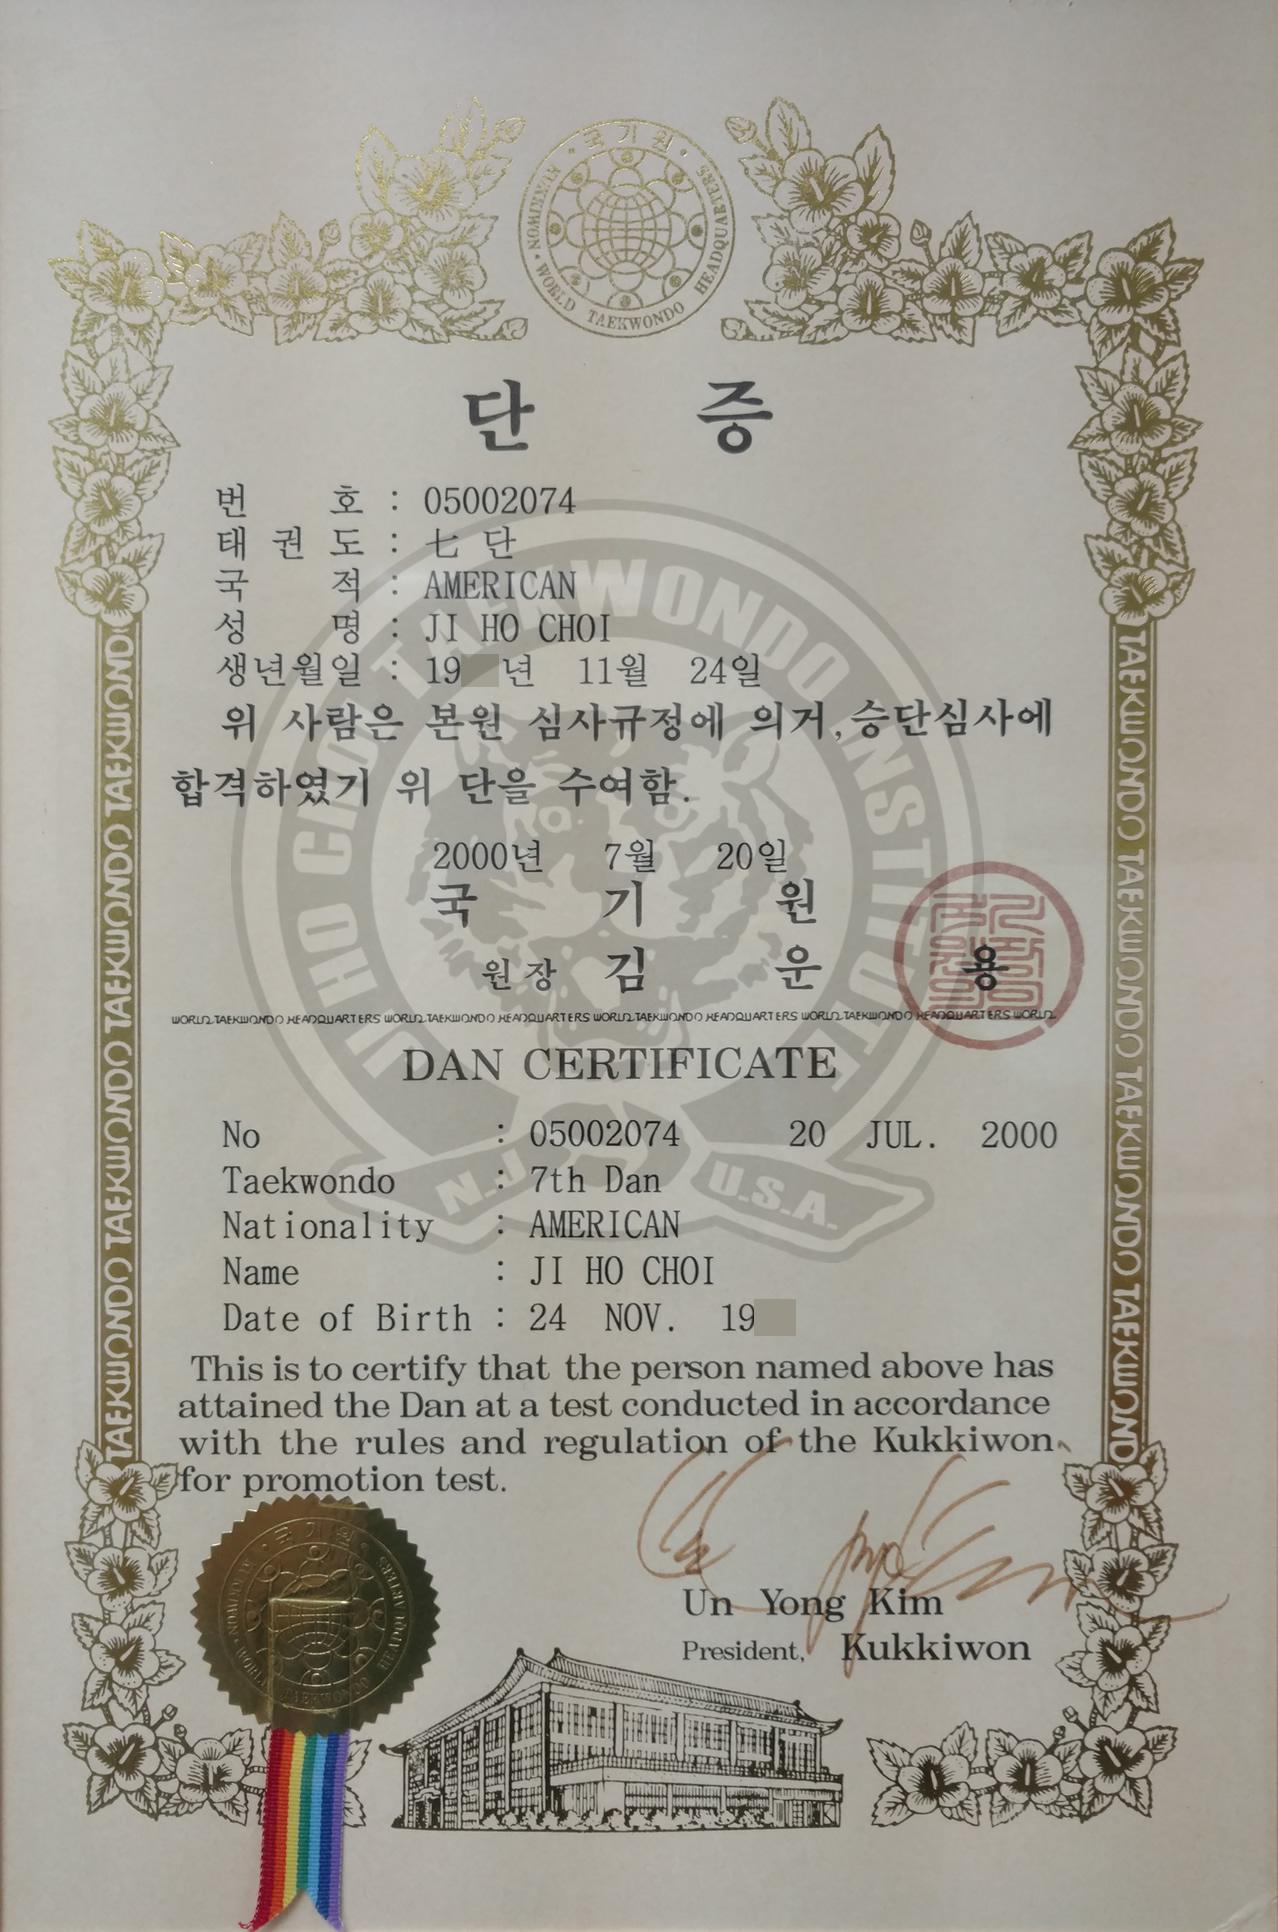 Jihochoi Tkd Inst Gm Choi 7th Dan Certificate Fl Ji Ho Choi